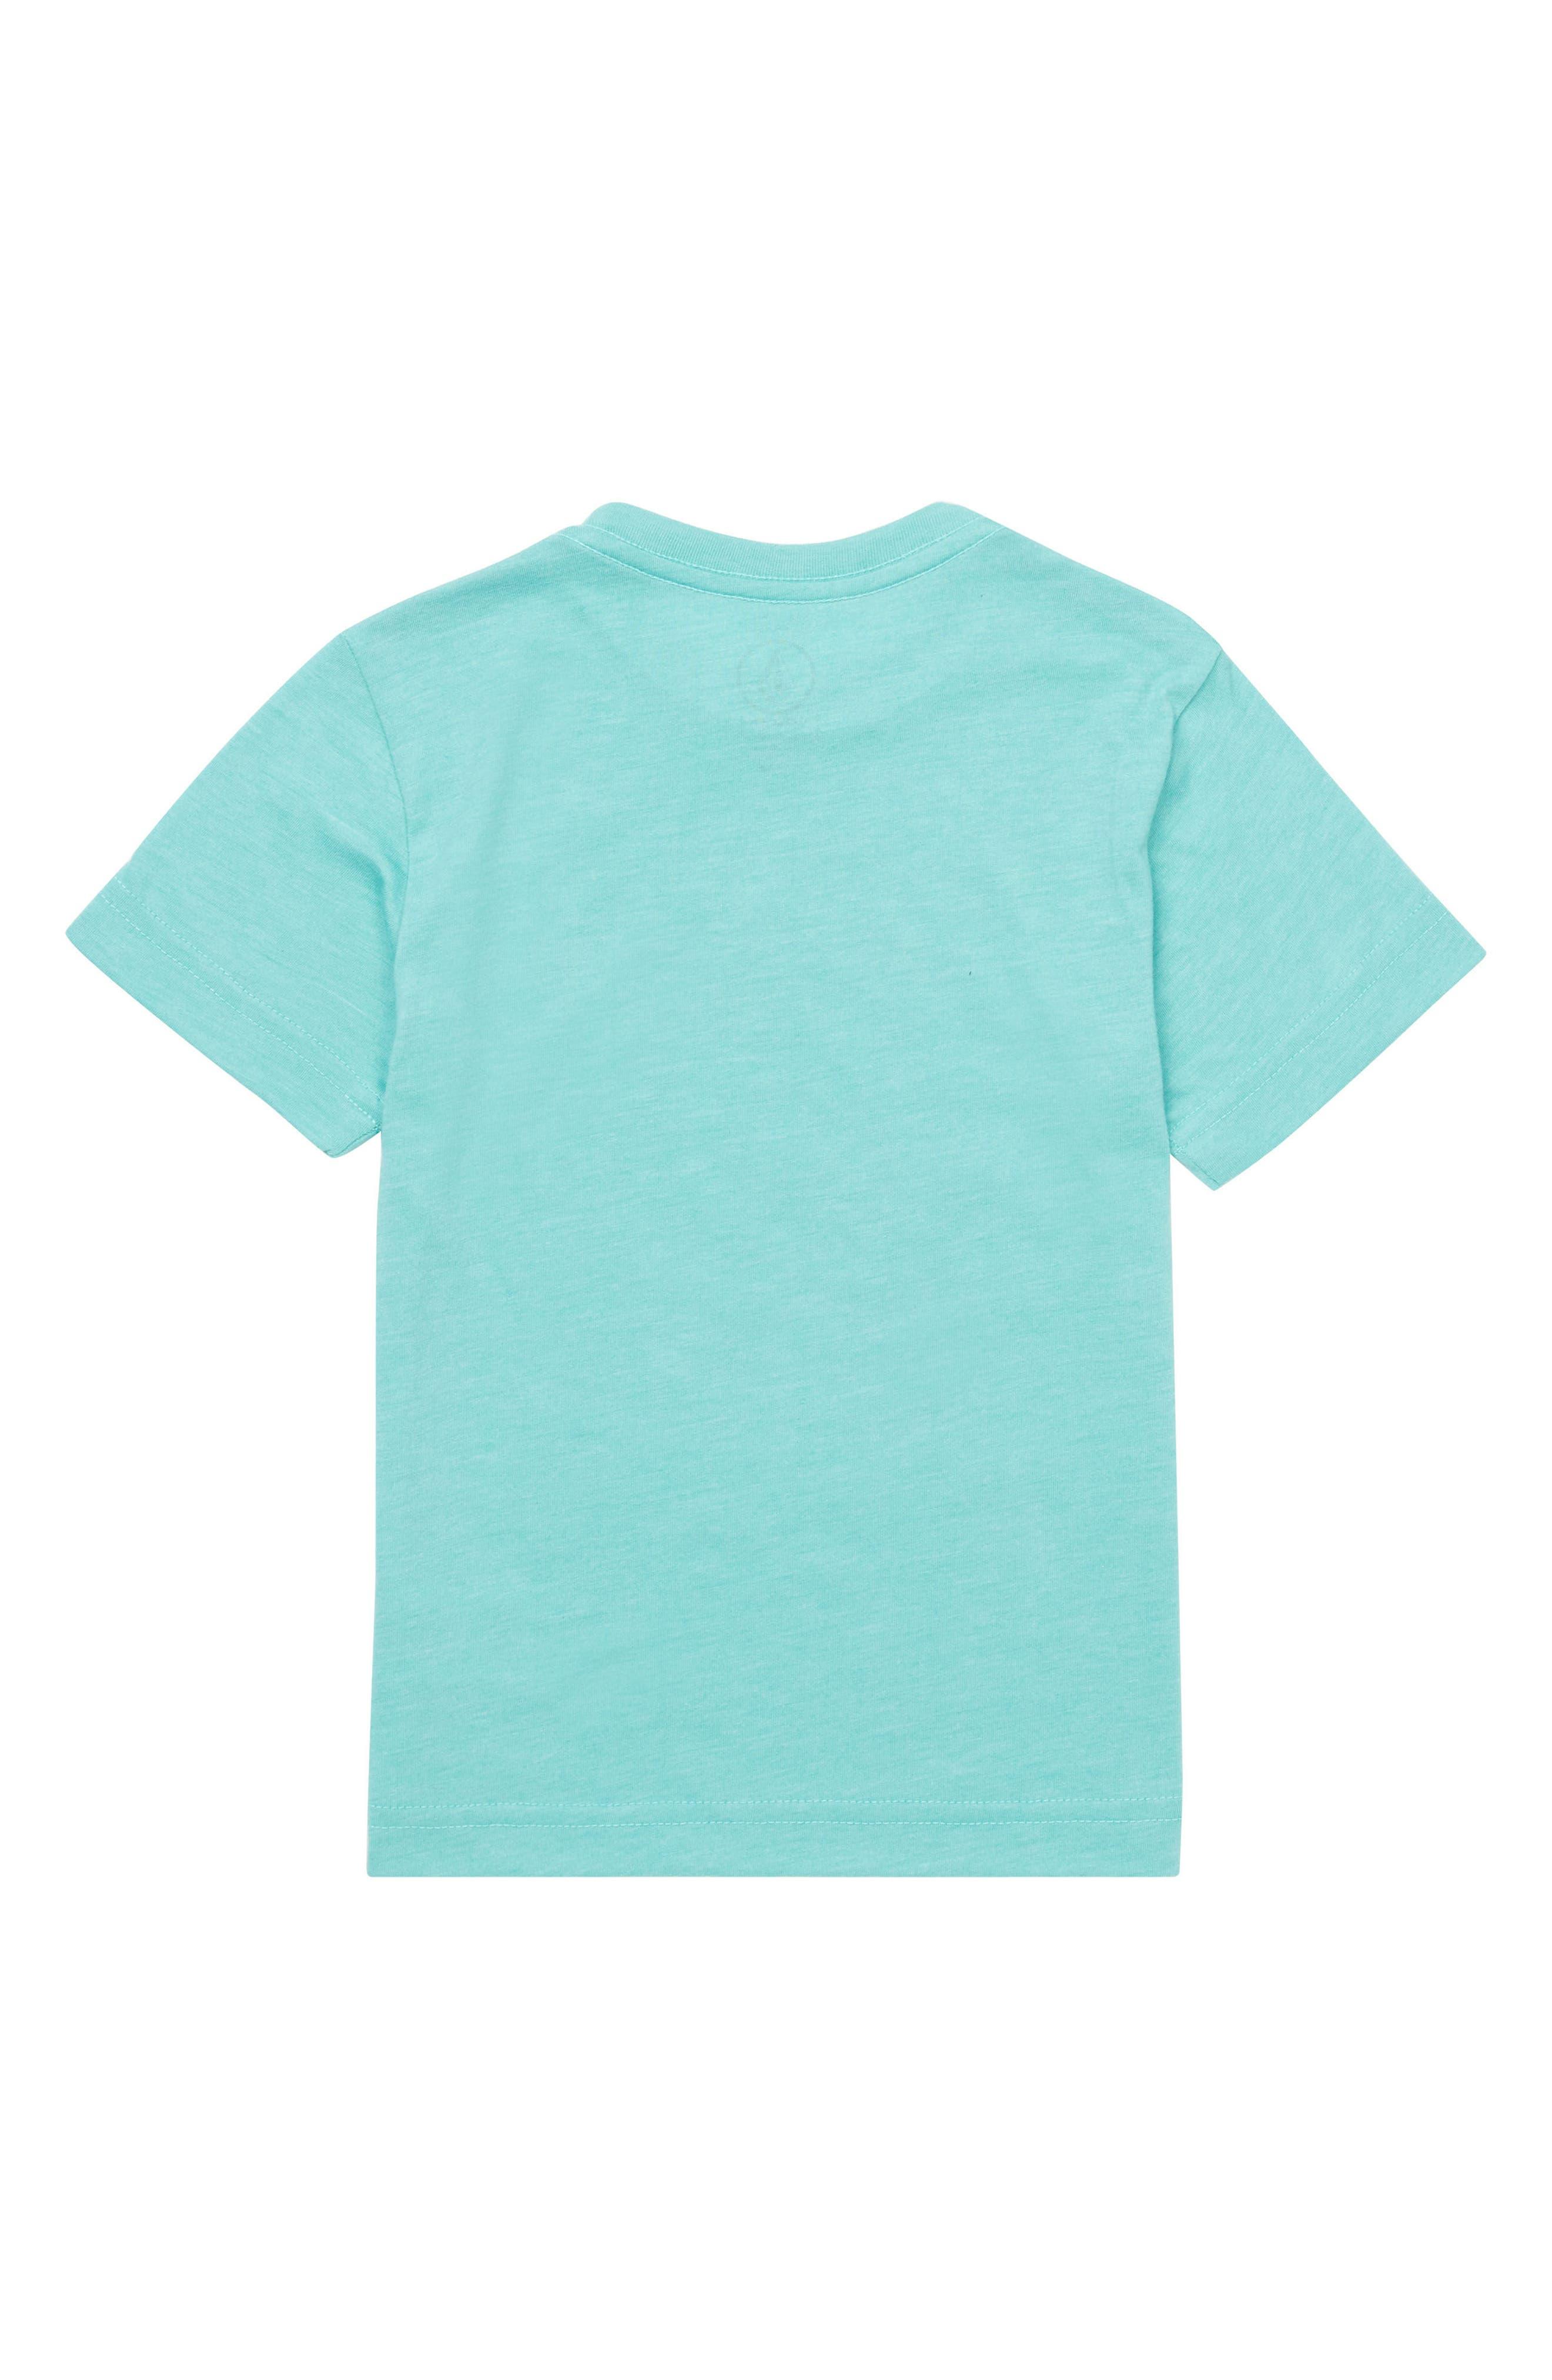 Statiq Graphic T-Shirt,                             Alternate thumbnail 2, color,                             440